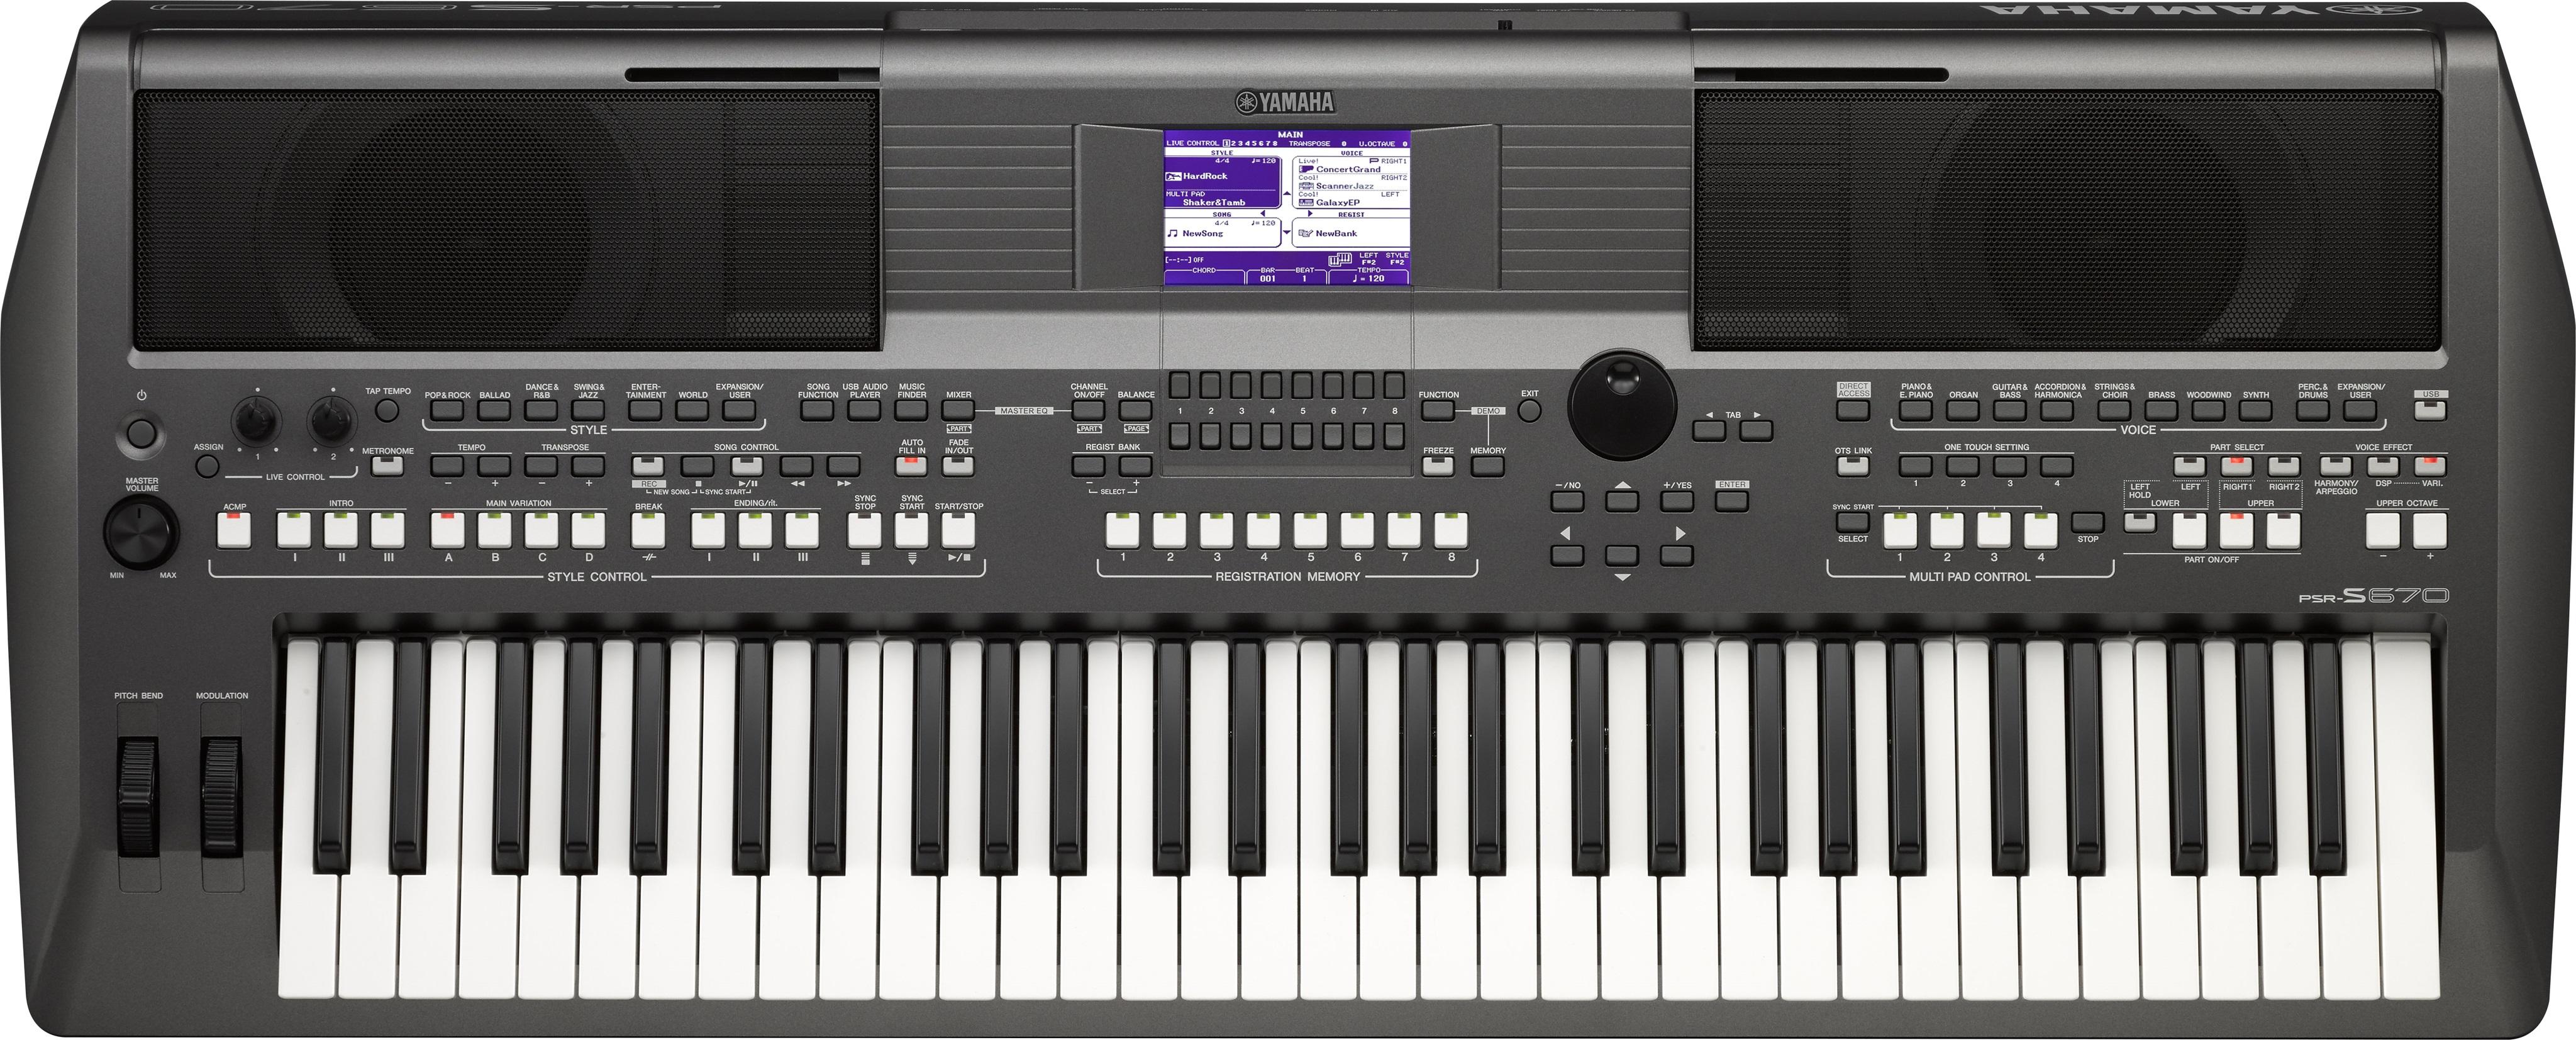 Yamaha PSR-S670